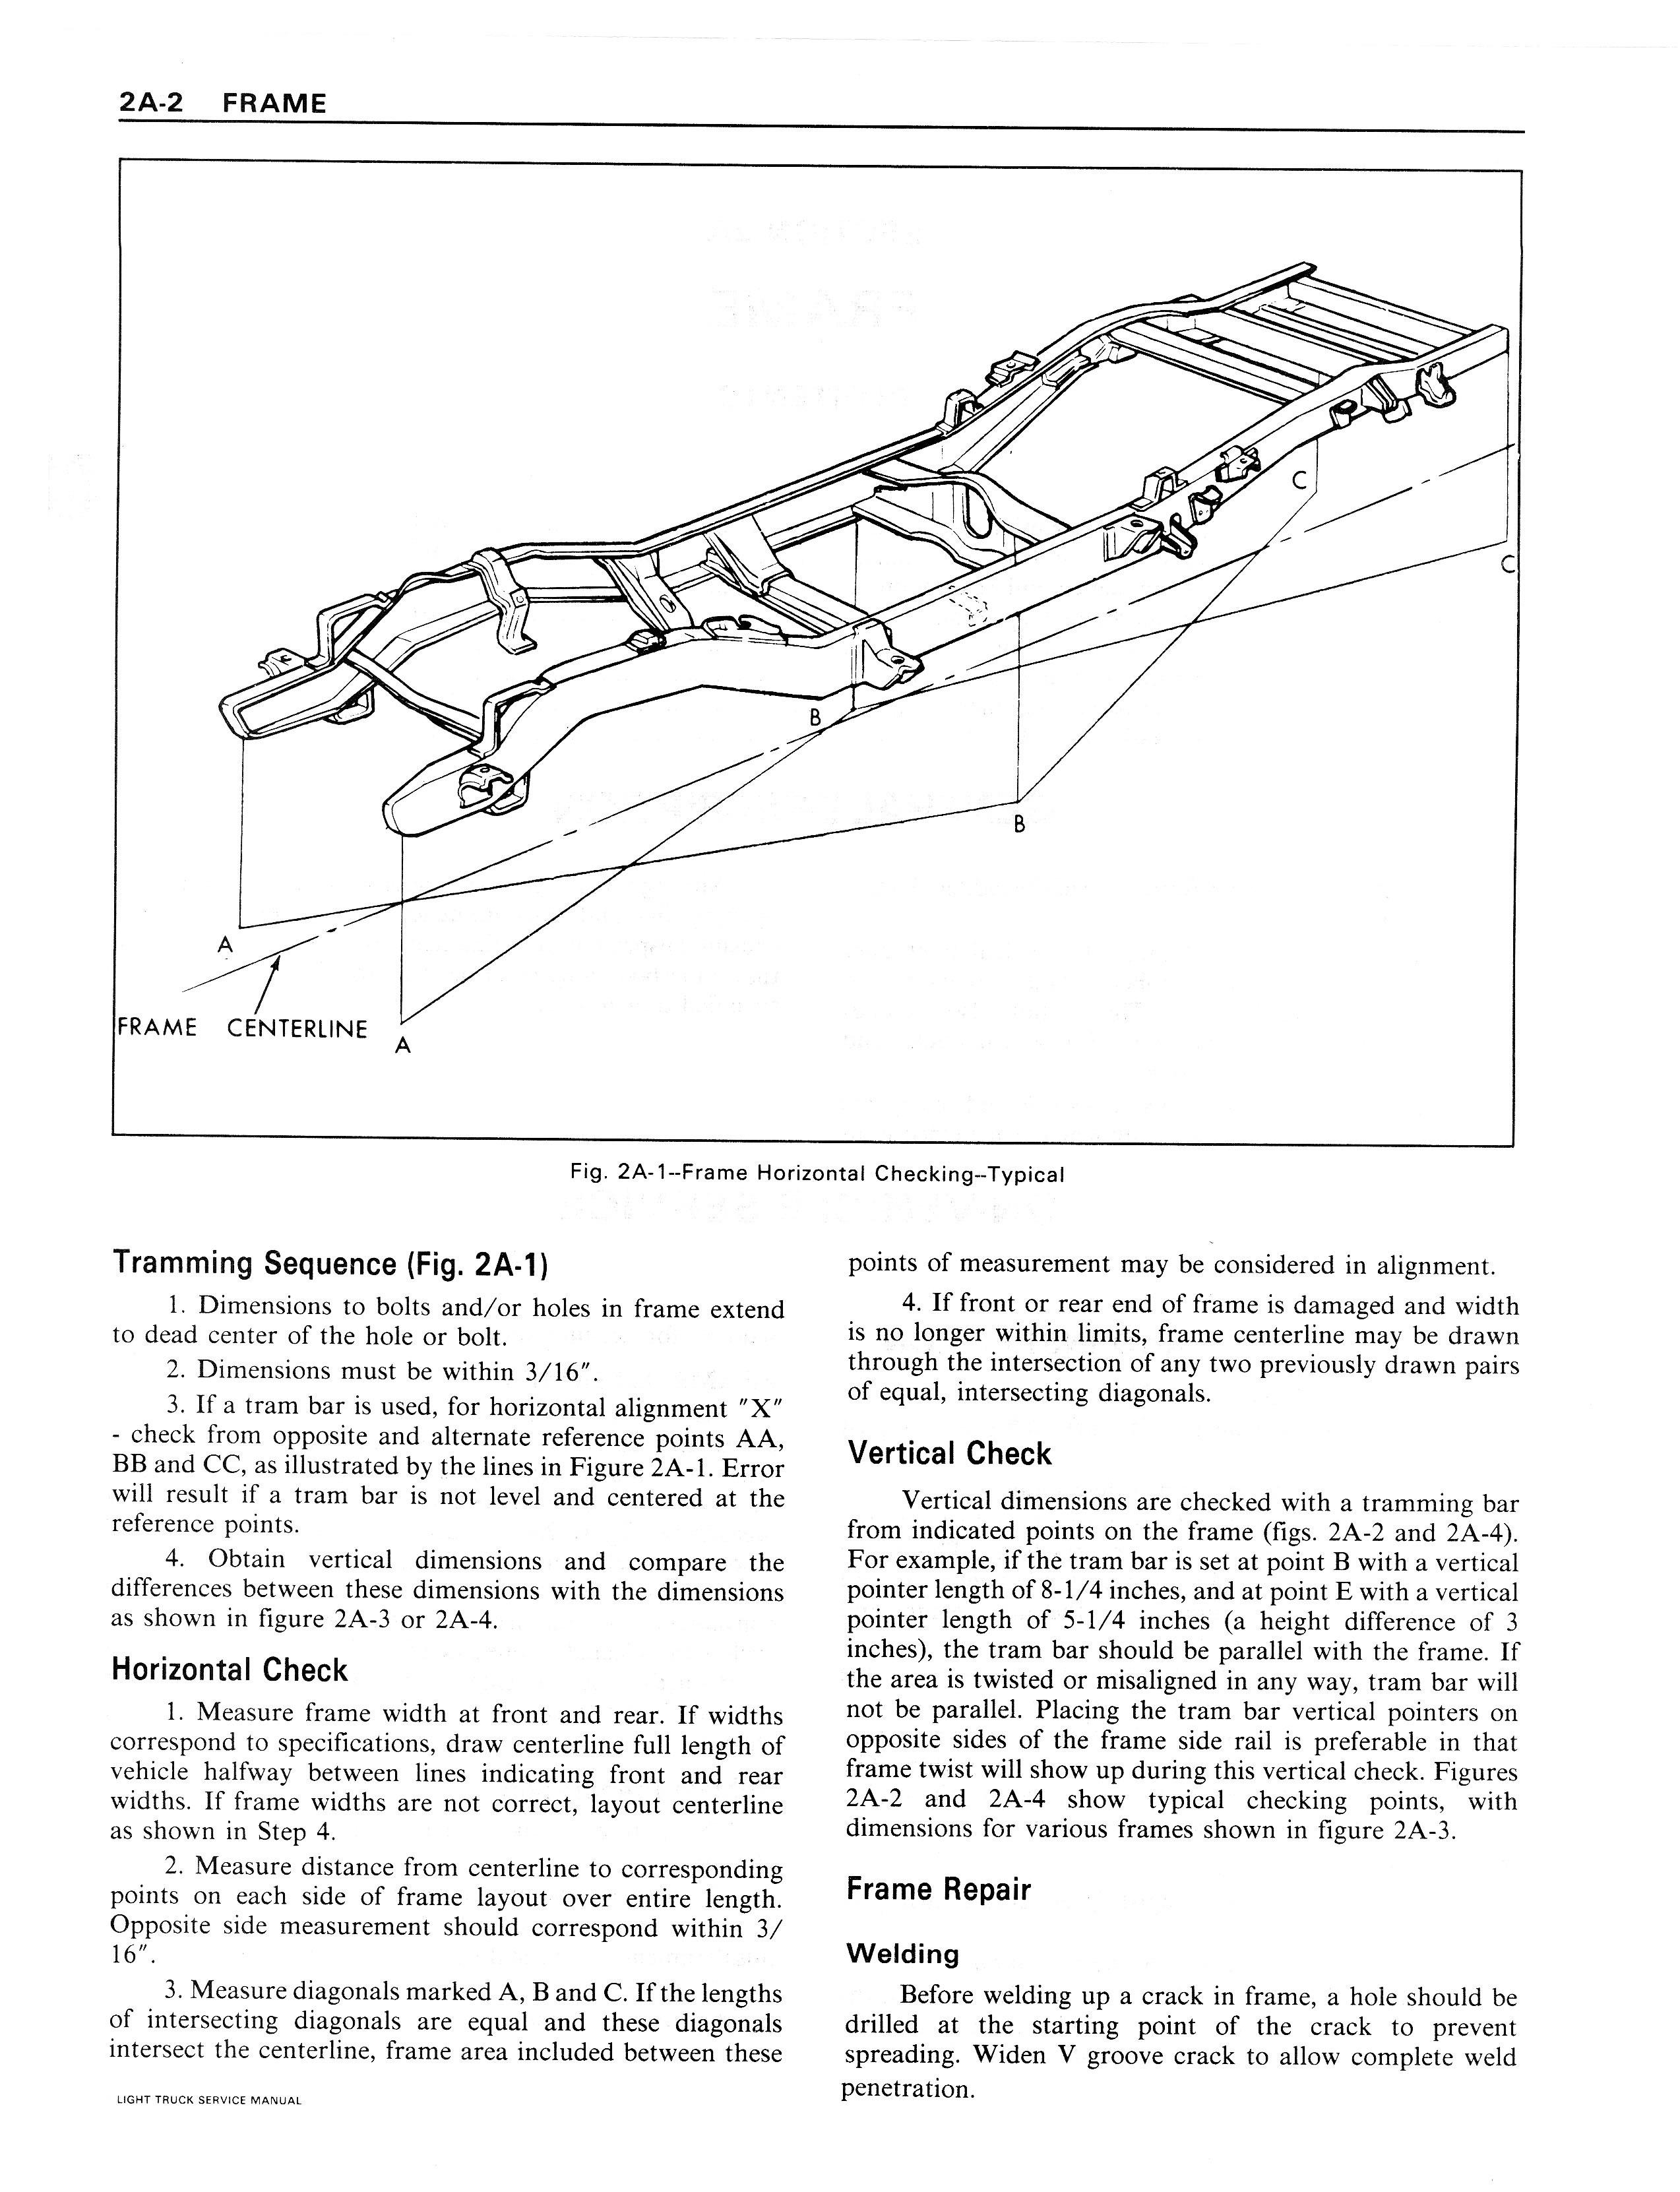 1979 GMC Series 10-35 Frame / 79GMCService0106.jpg